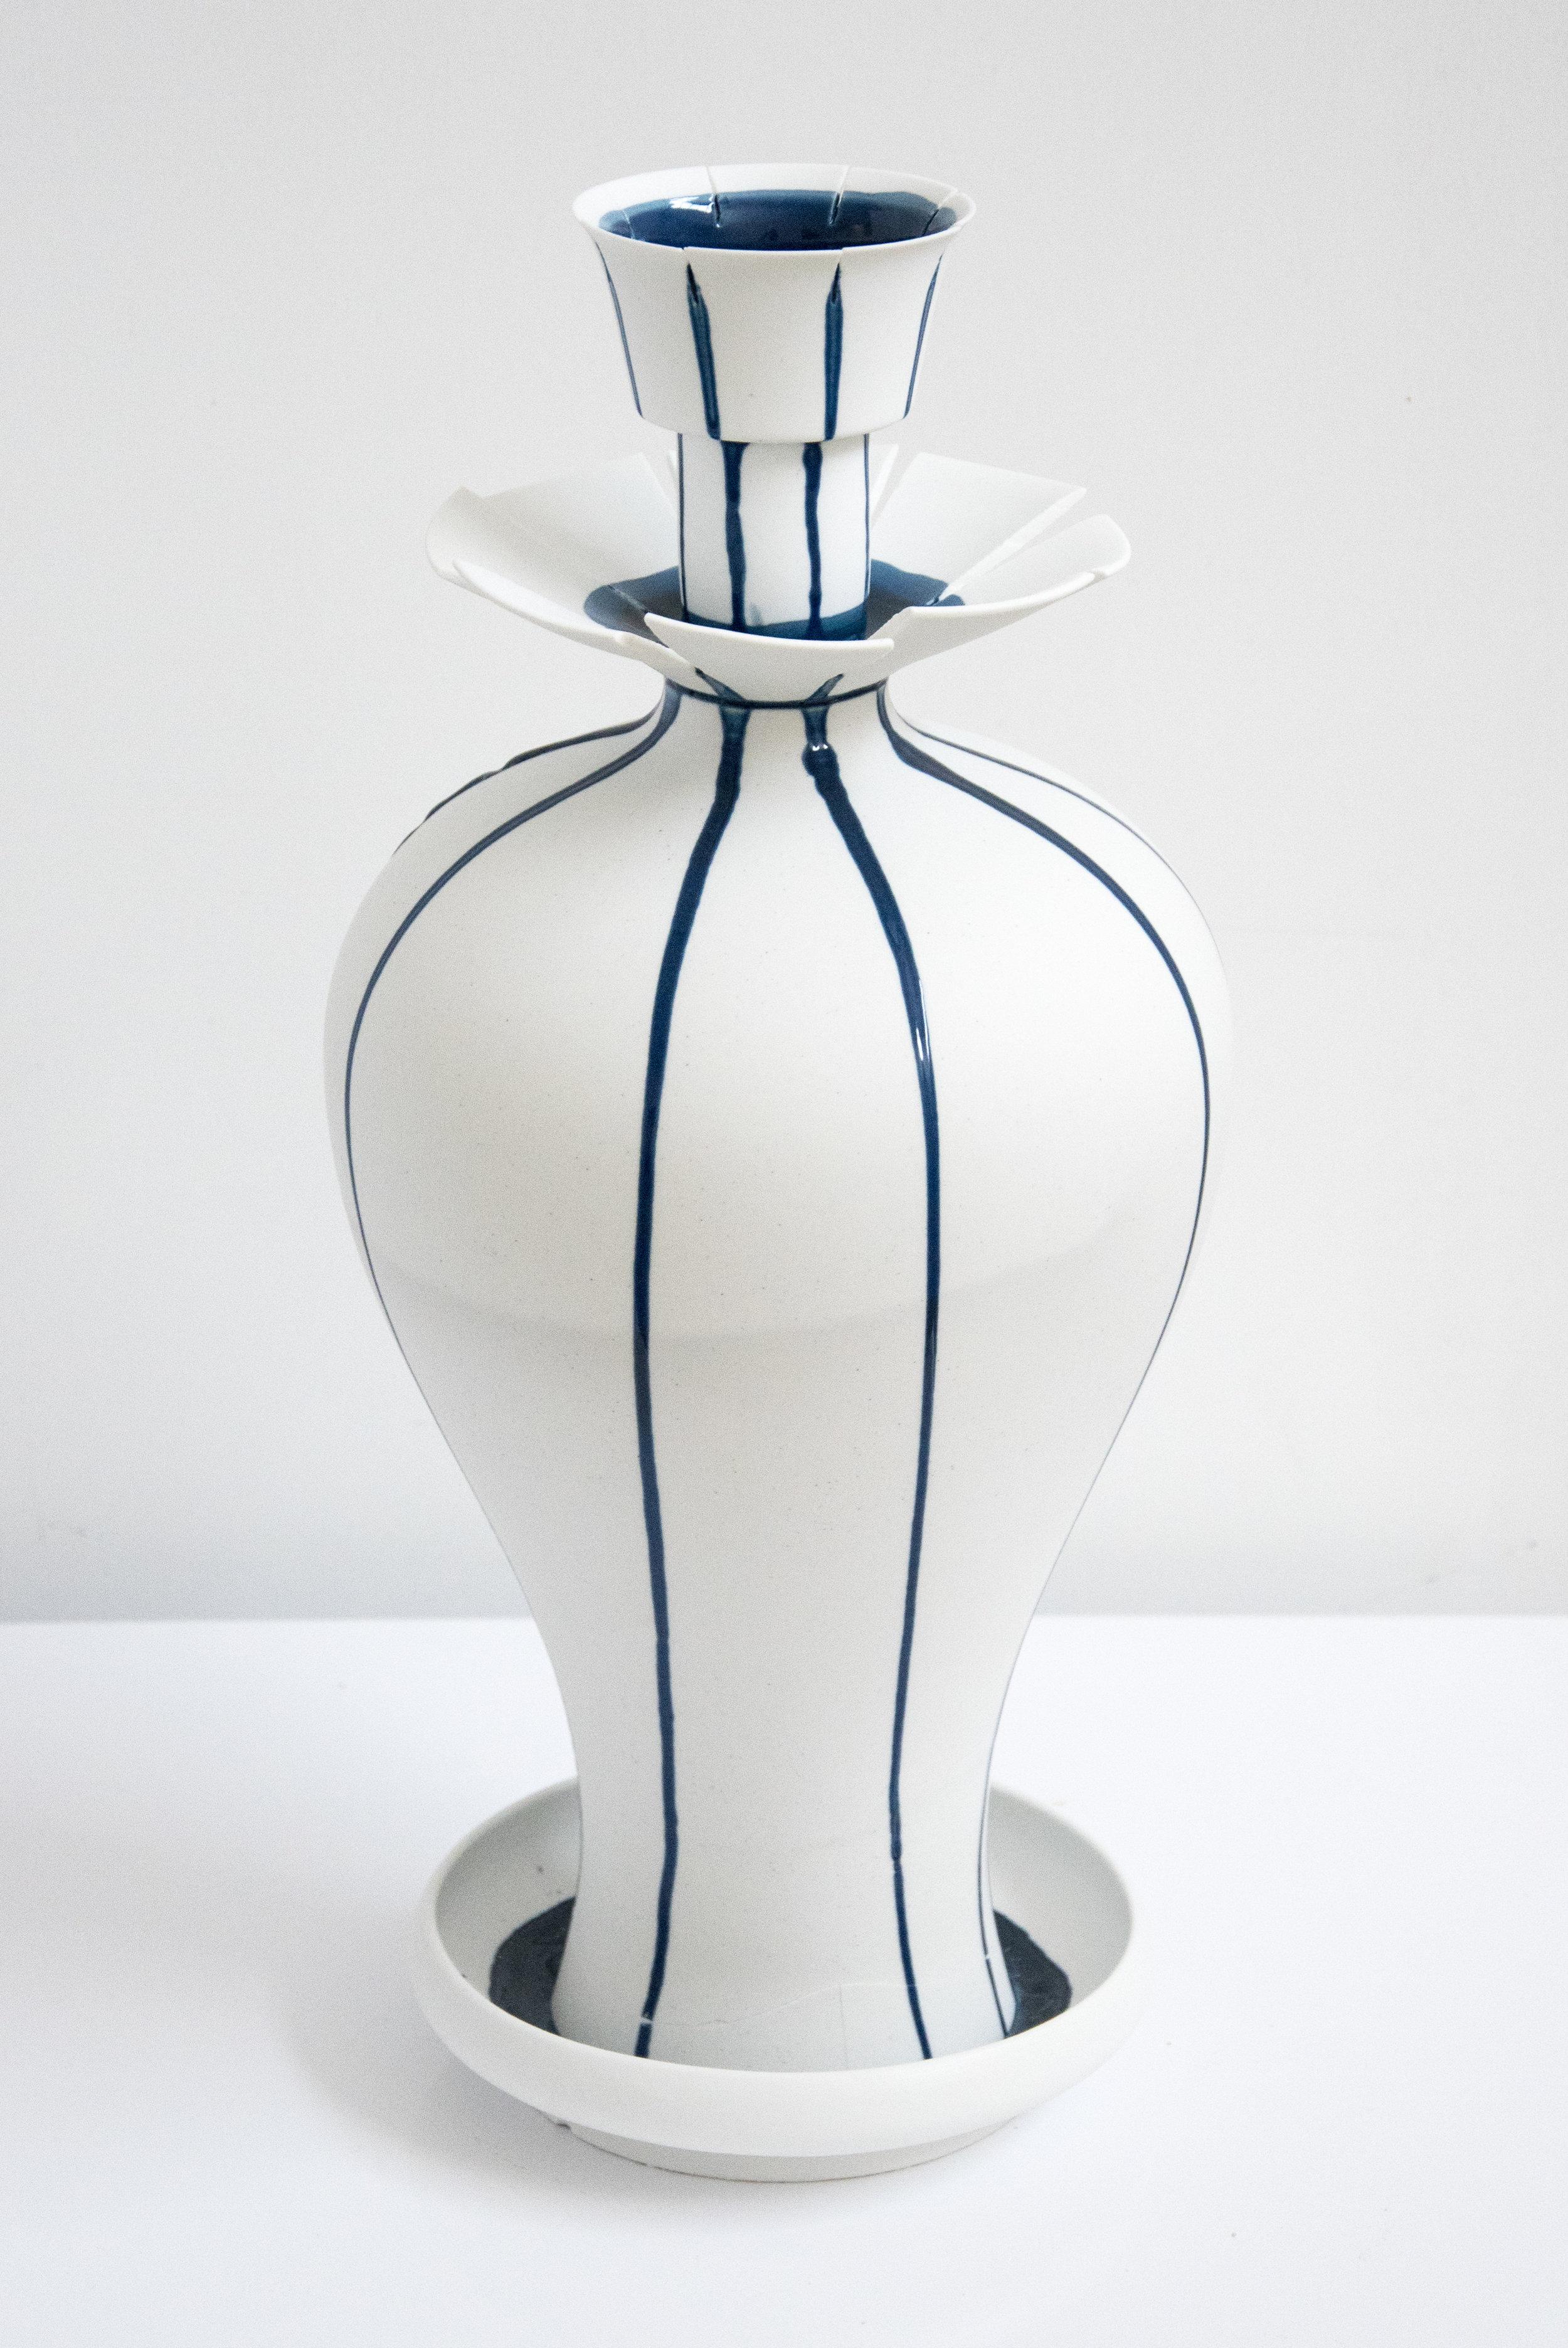 JDZ porcelain works - David Derksen17.jpg